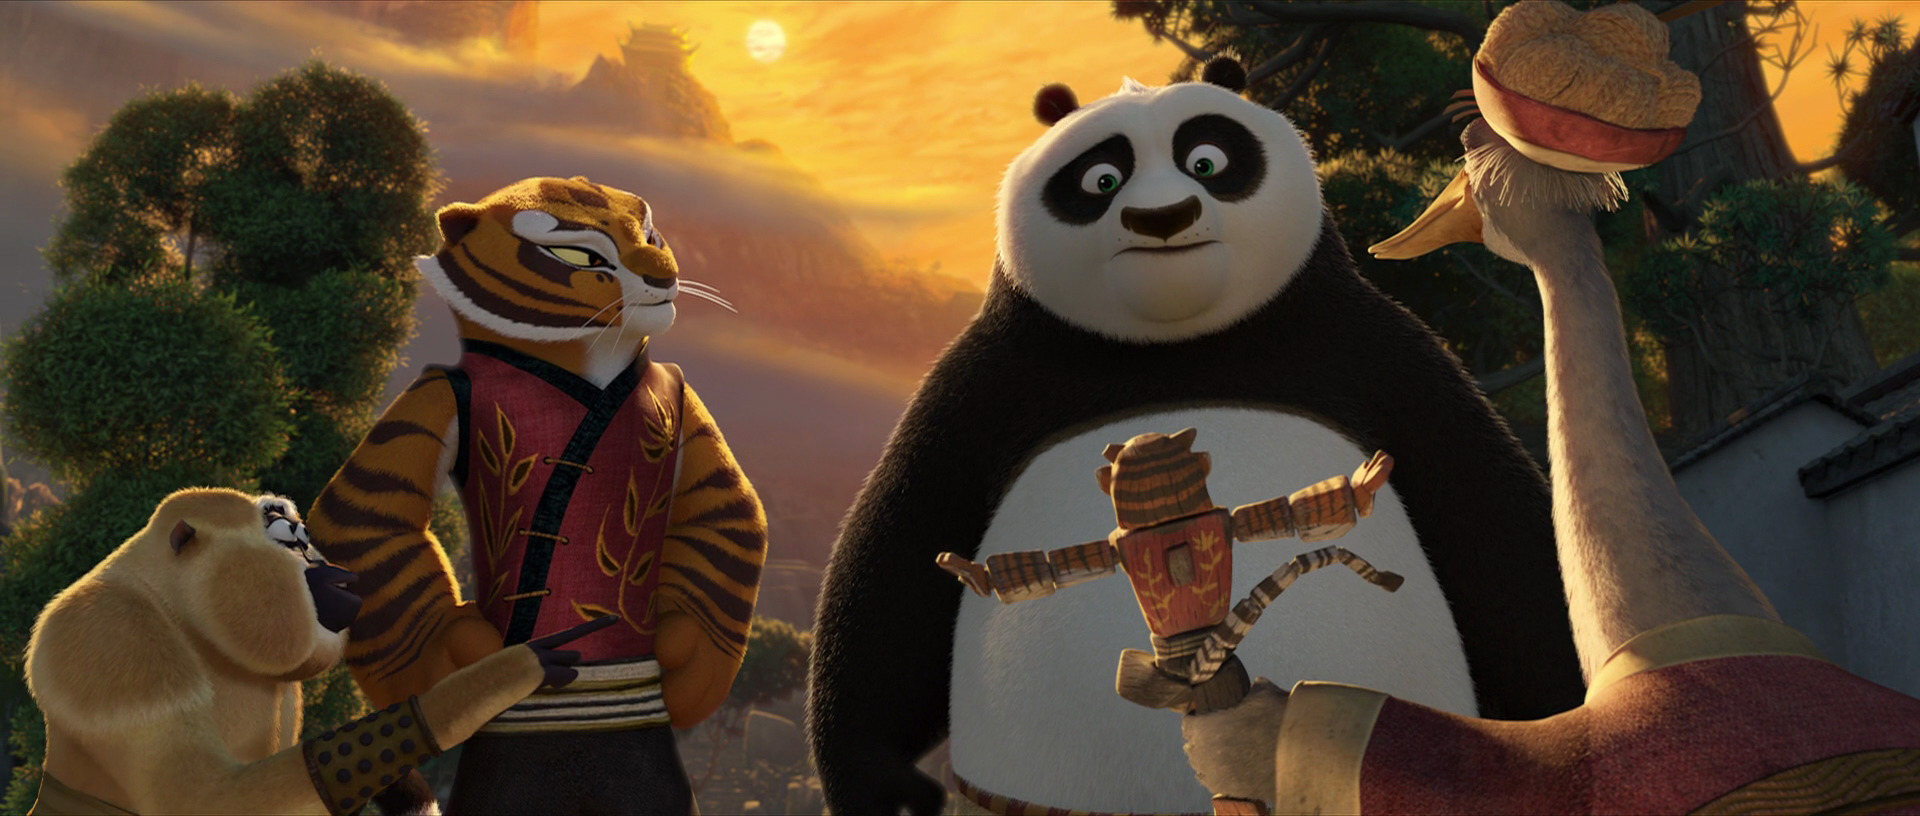 image - tigress-action-figure-kung-fu-panda-2-22487938-1440-900